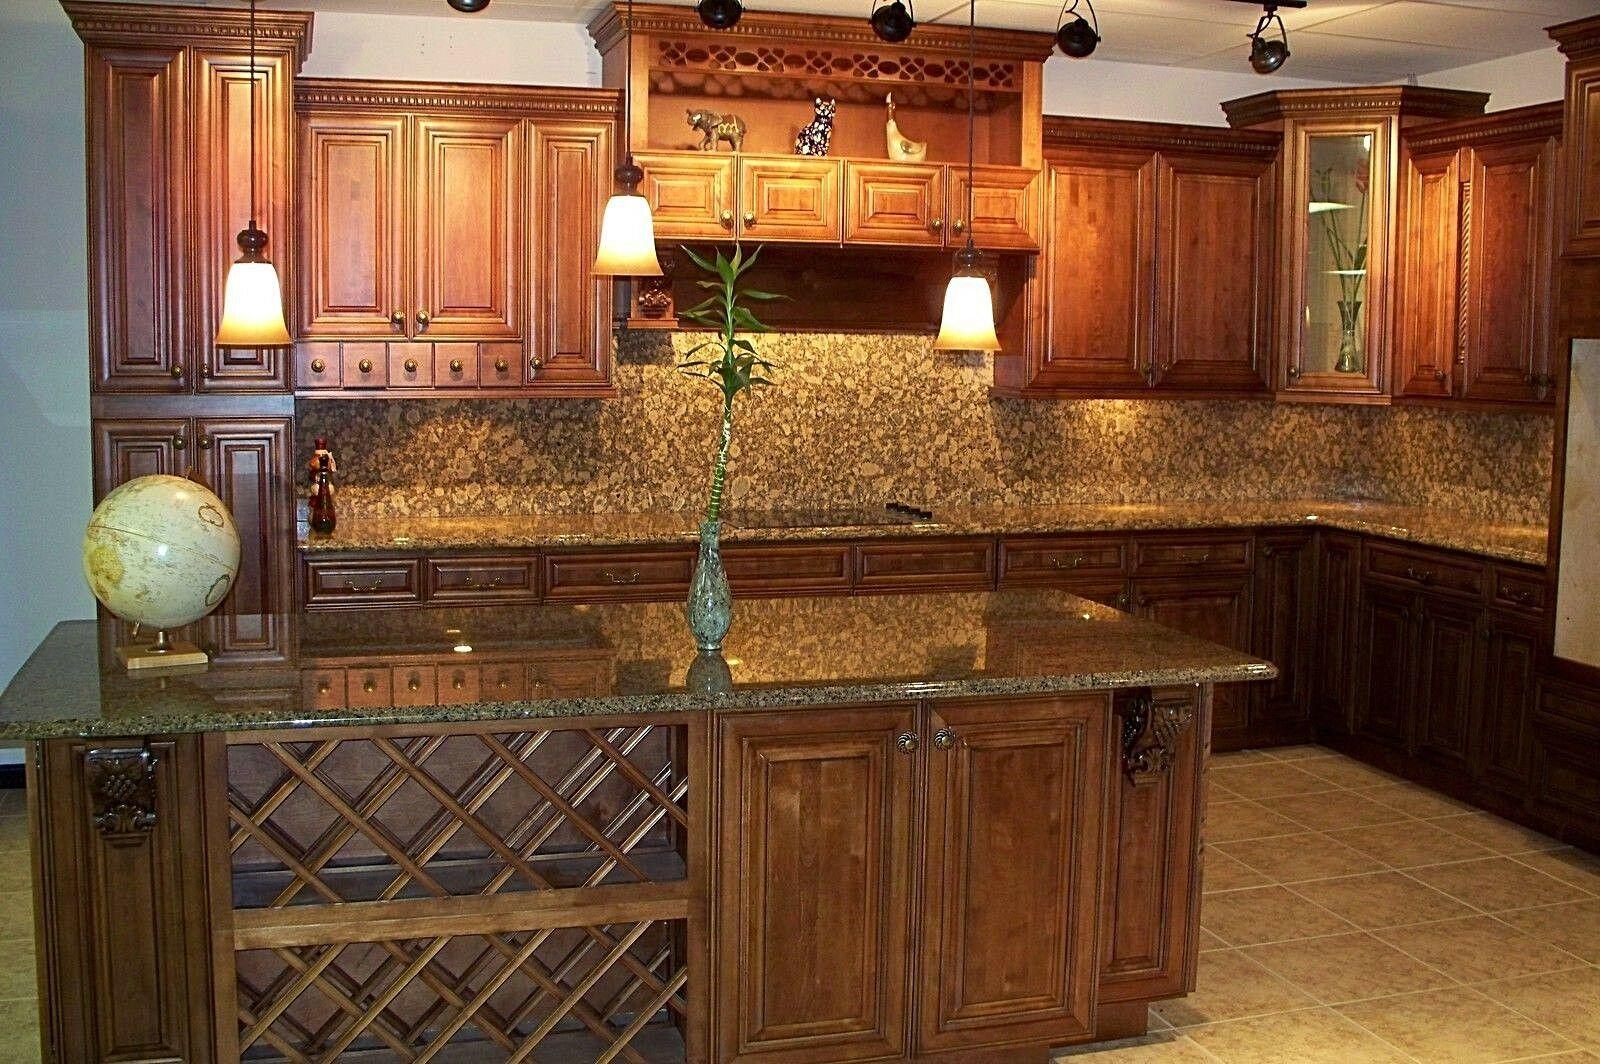 Premium Designer All Wood Kitchen Cabinets Chocolate Maple 10x10 Layout Buy Kitchen Cabinets Online Wood Kitchen Cabinets Online Kitchen Cabinets